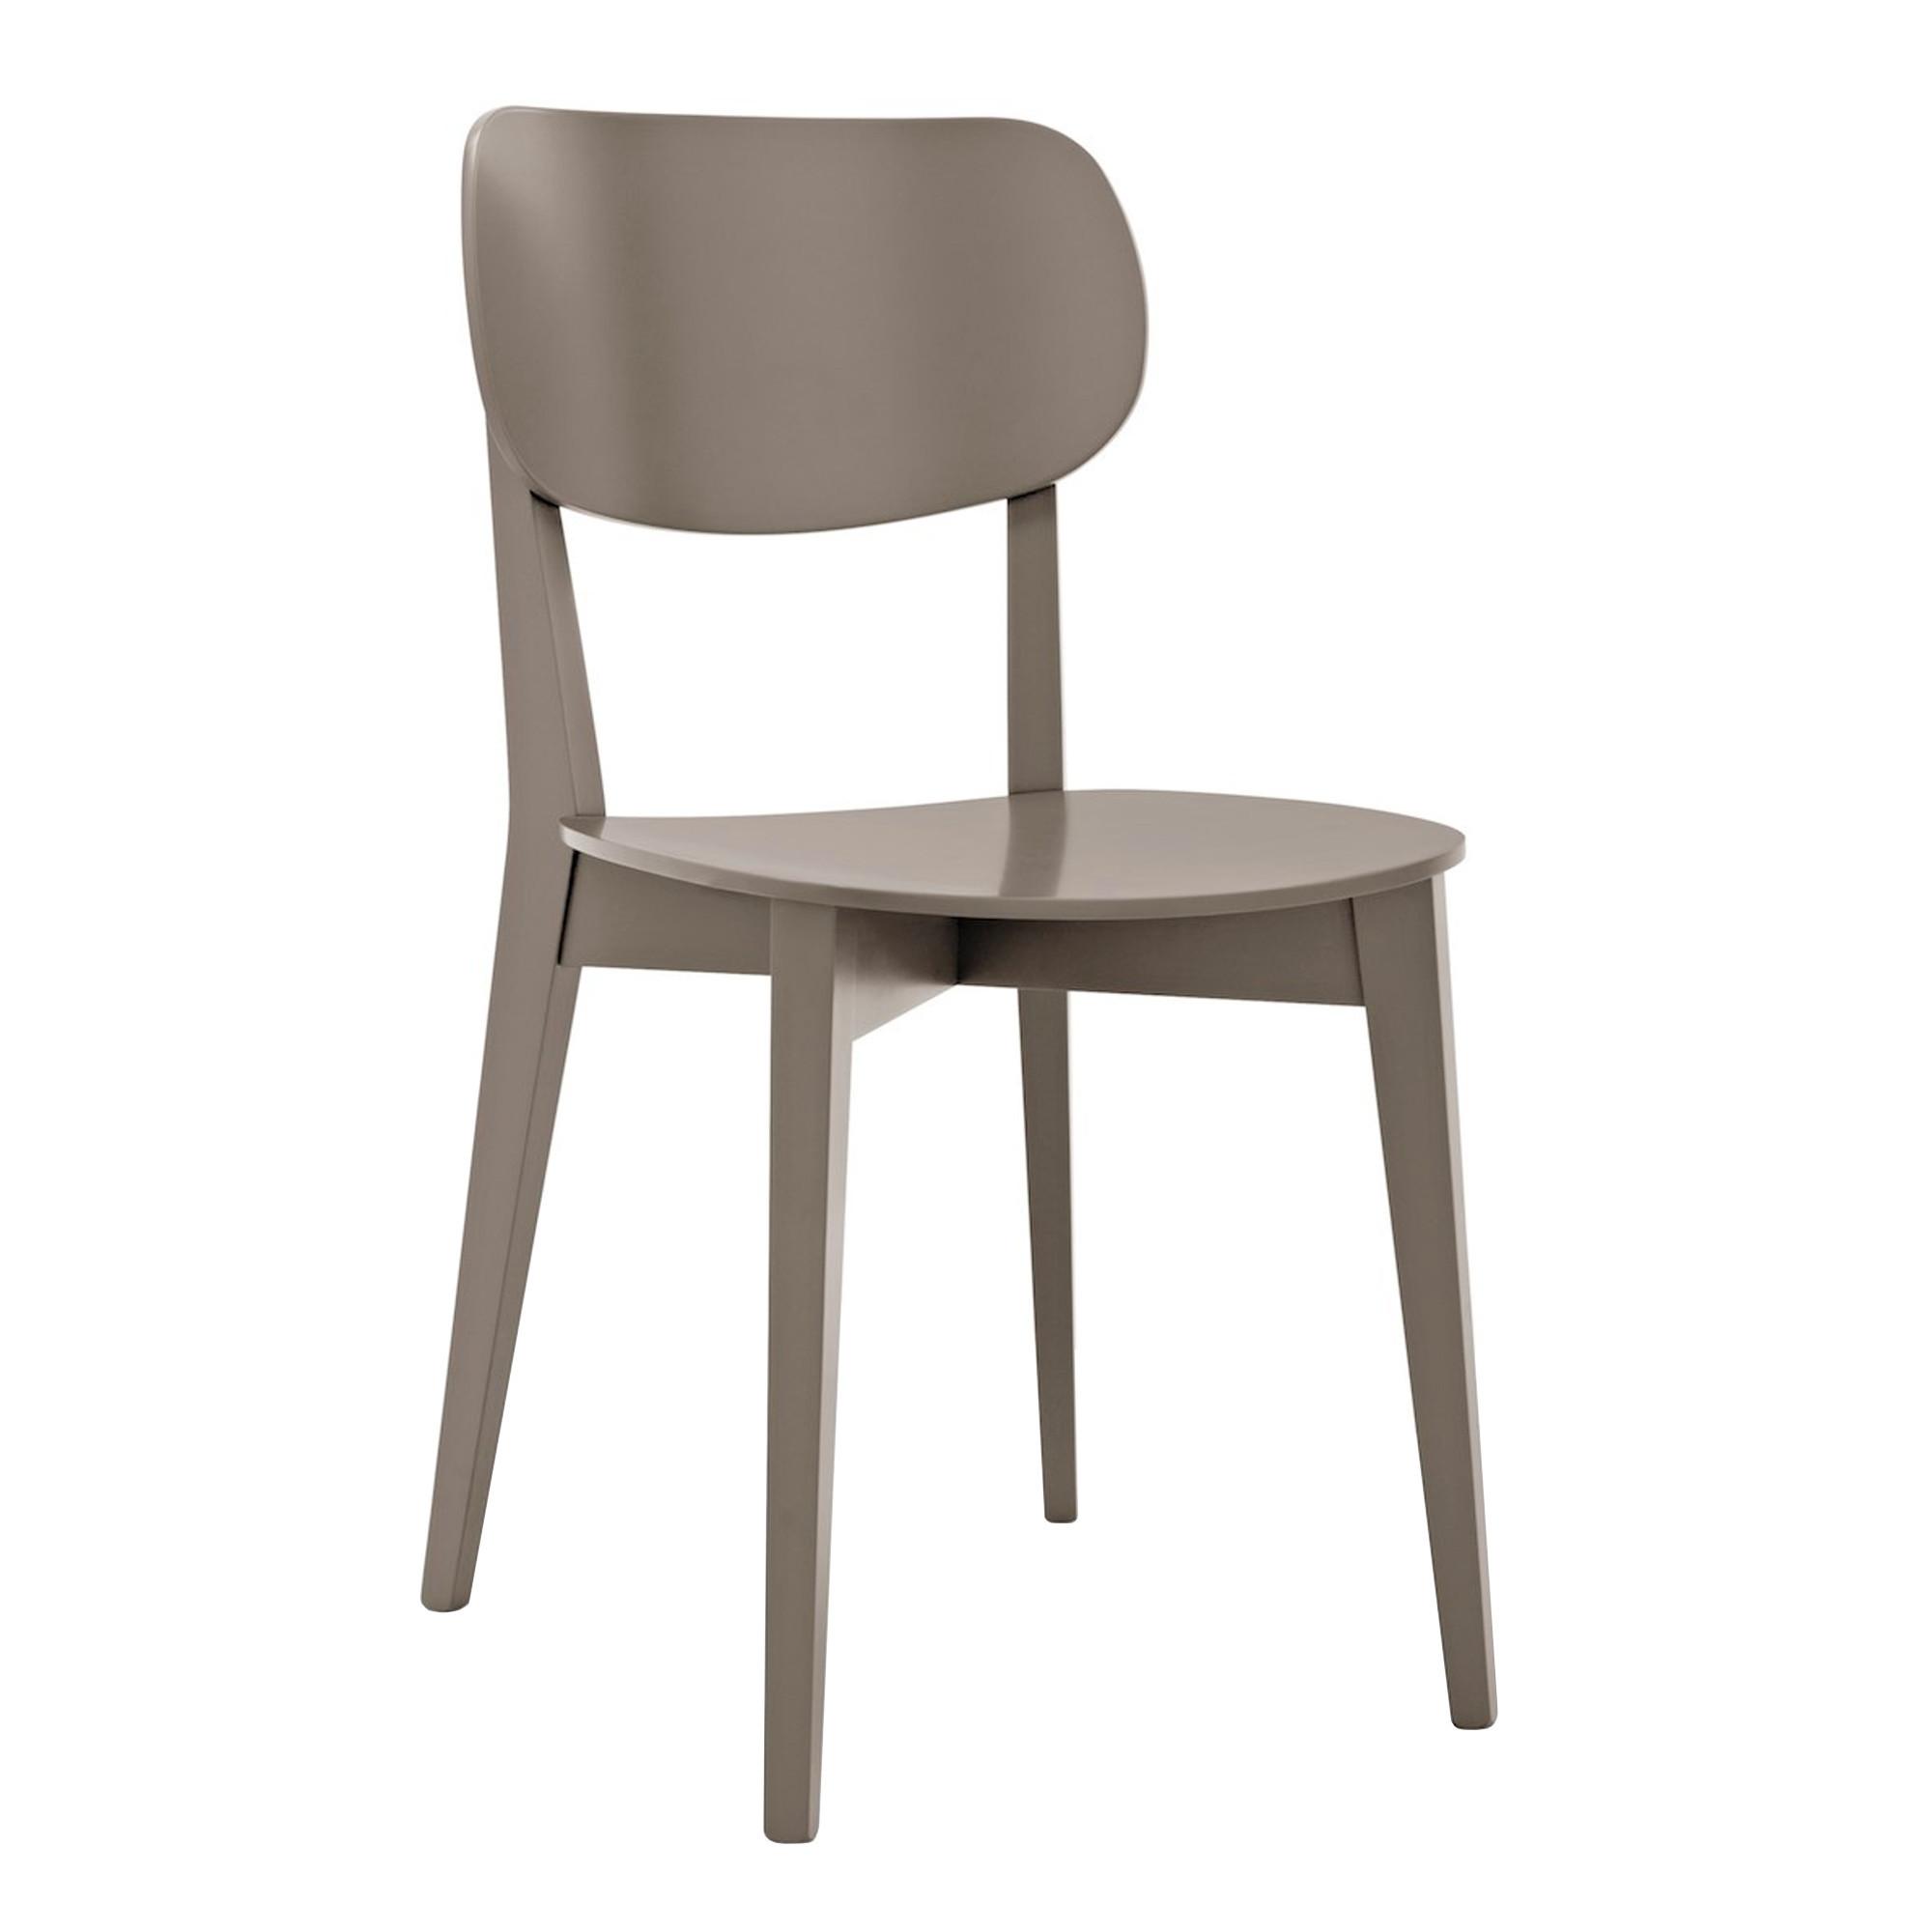 sedia legno robinson o&g calligaris division6 | Sedie